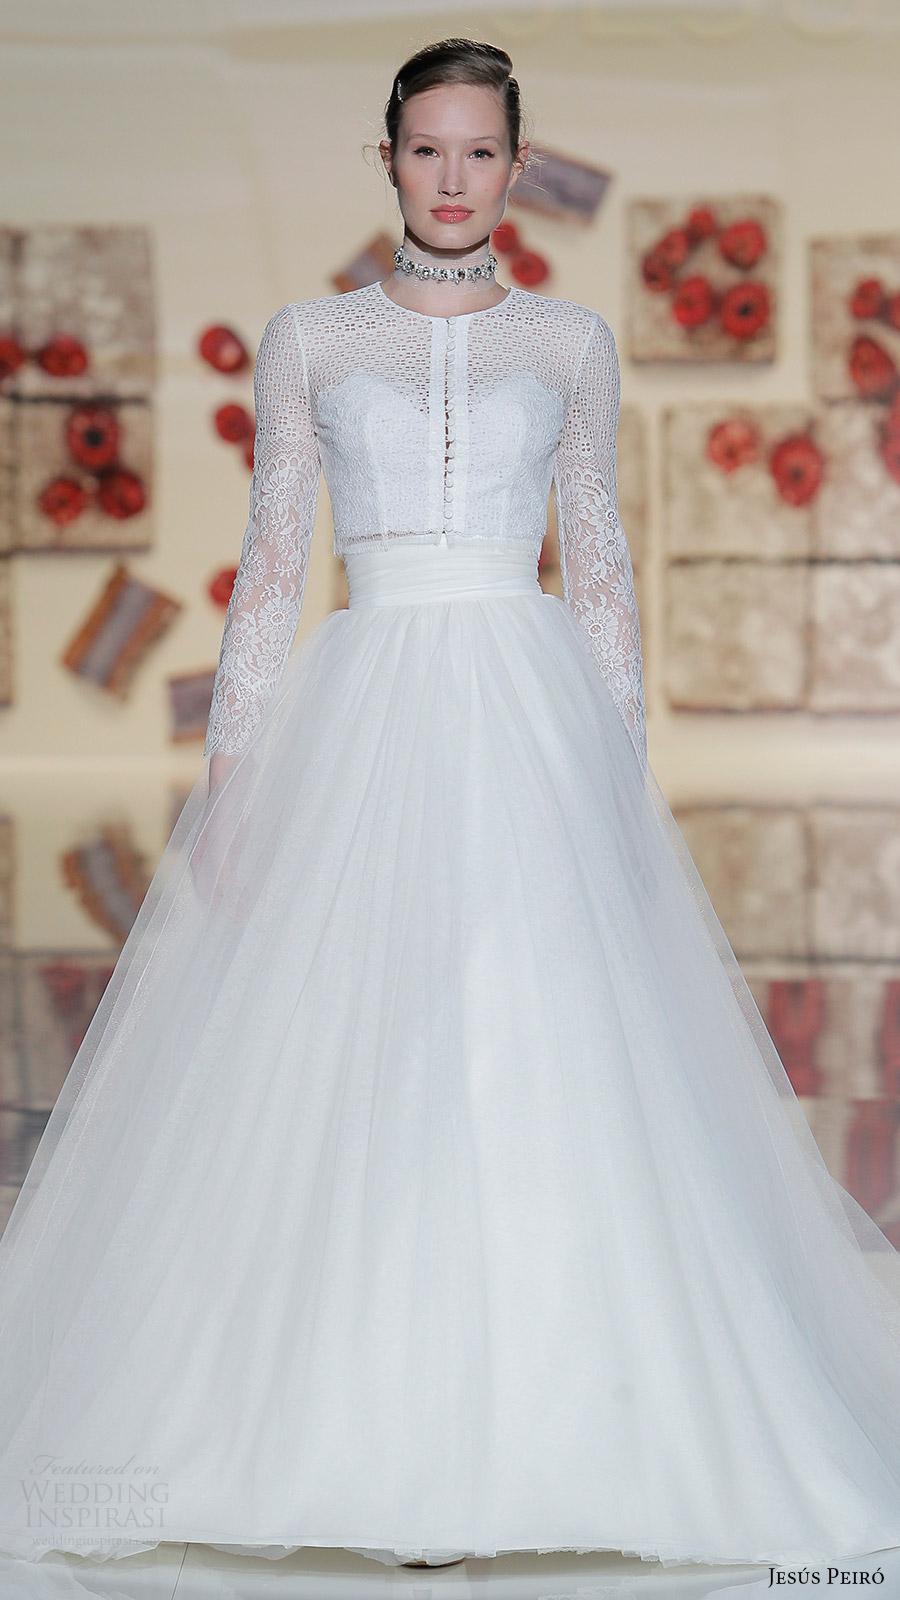 jesus peiro bridal 2017 long sleeves jewel neck button top aline skirt two piece wedidng dress (03) mv